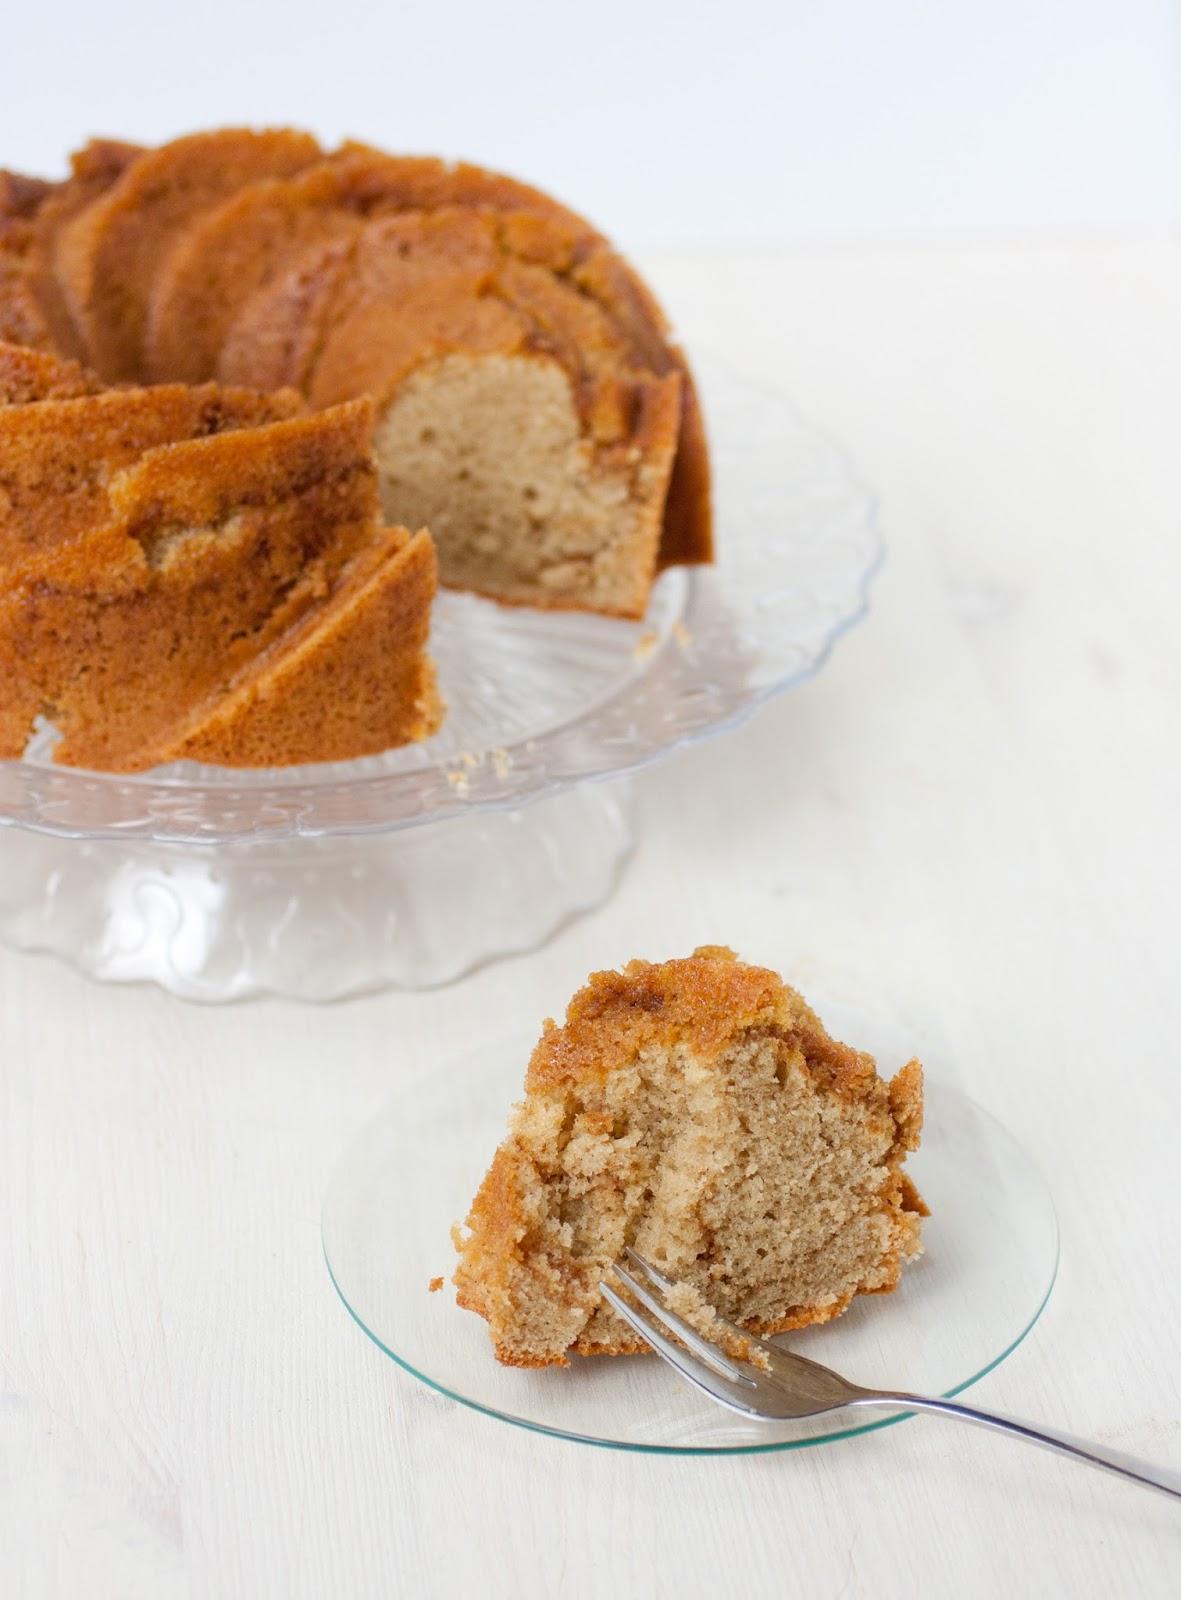 Spiced-Bundt-Cake-4.jpg